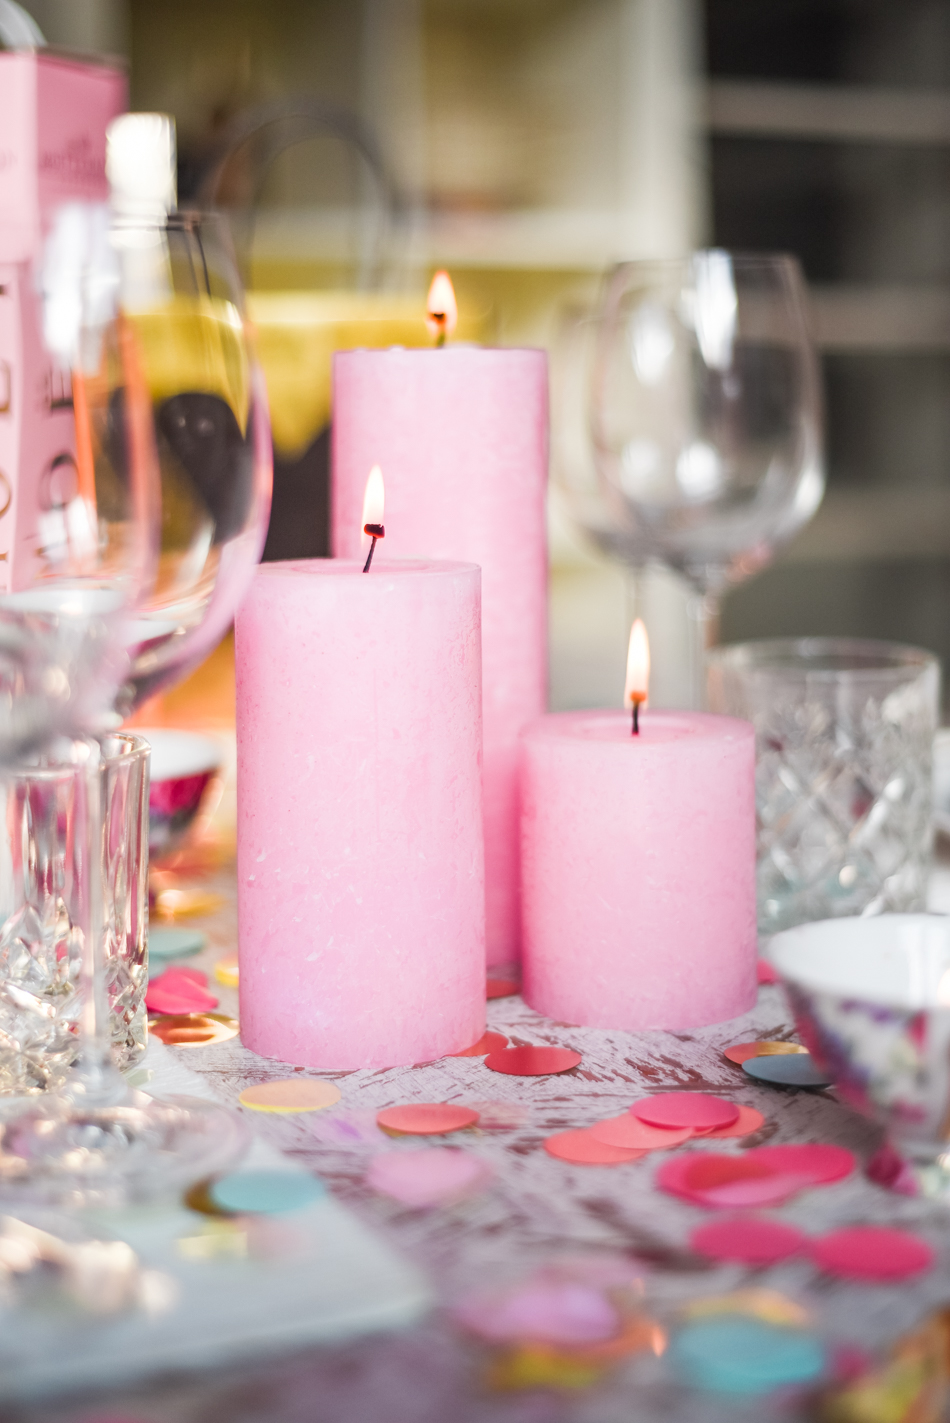 Valentinesday-table-setting-decor-styling-AnaisStoelen-9.jpg